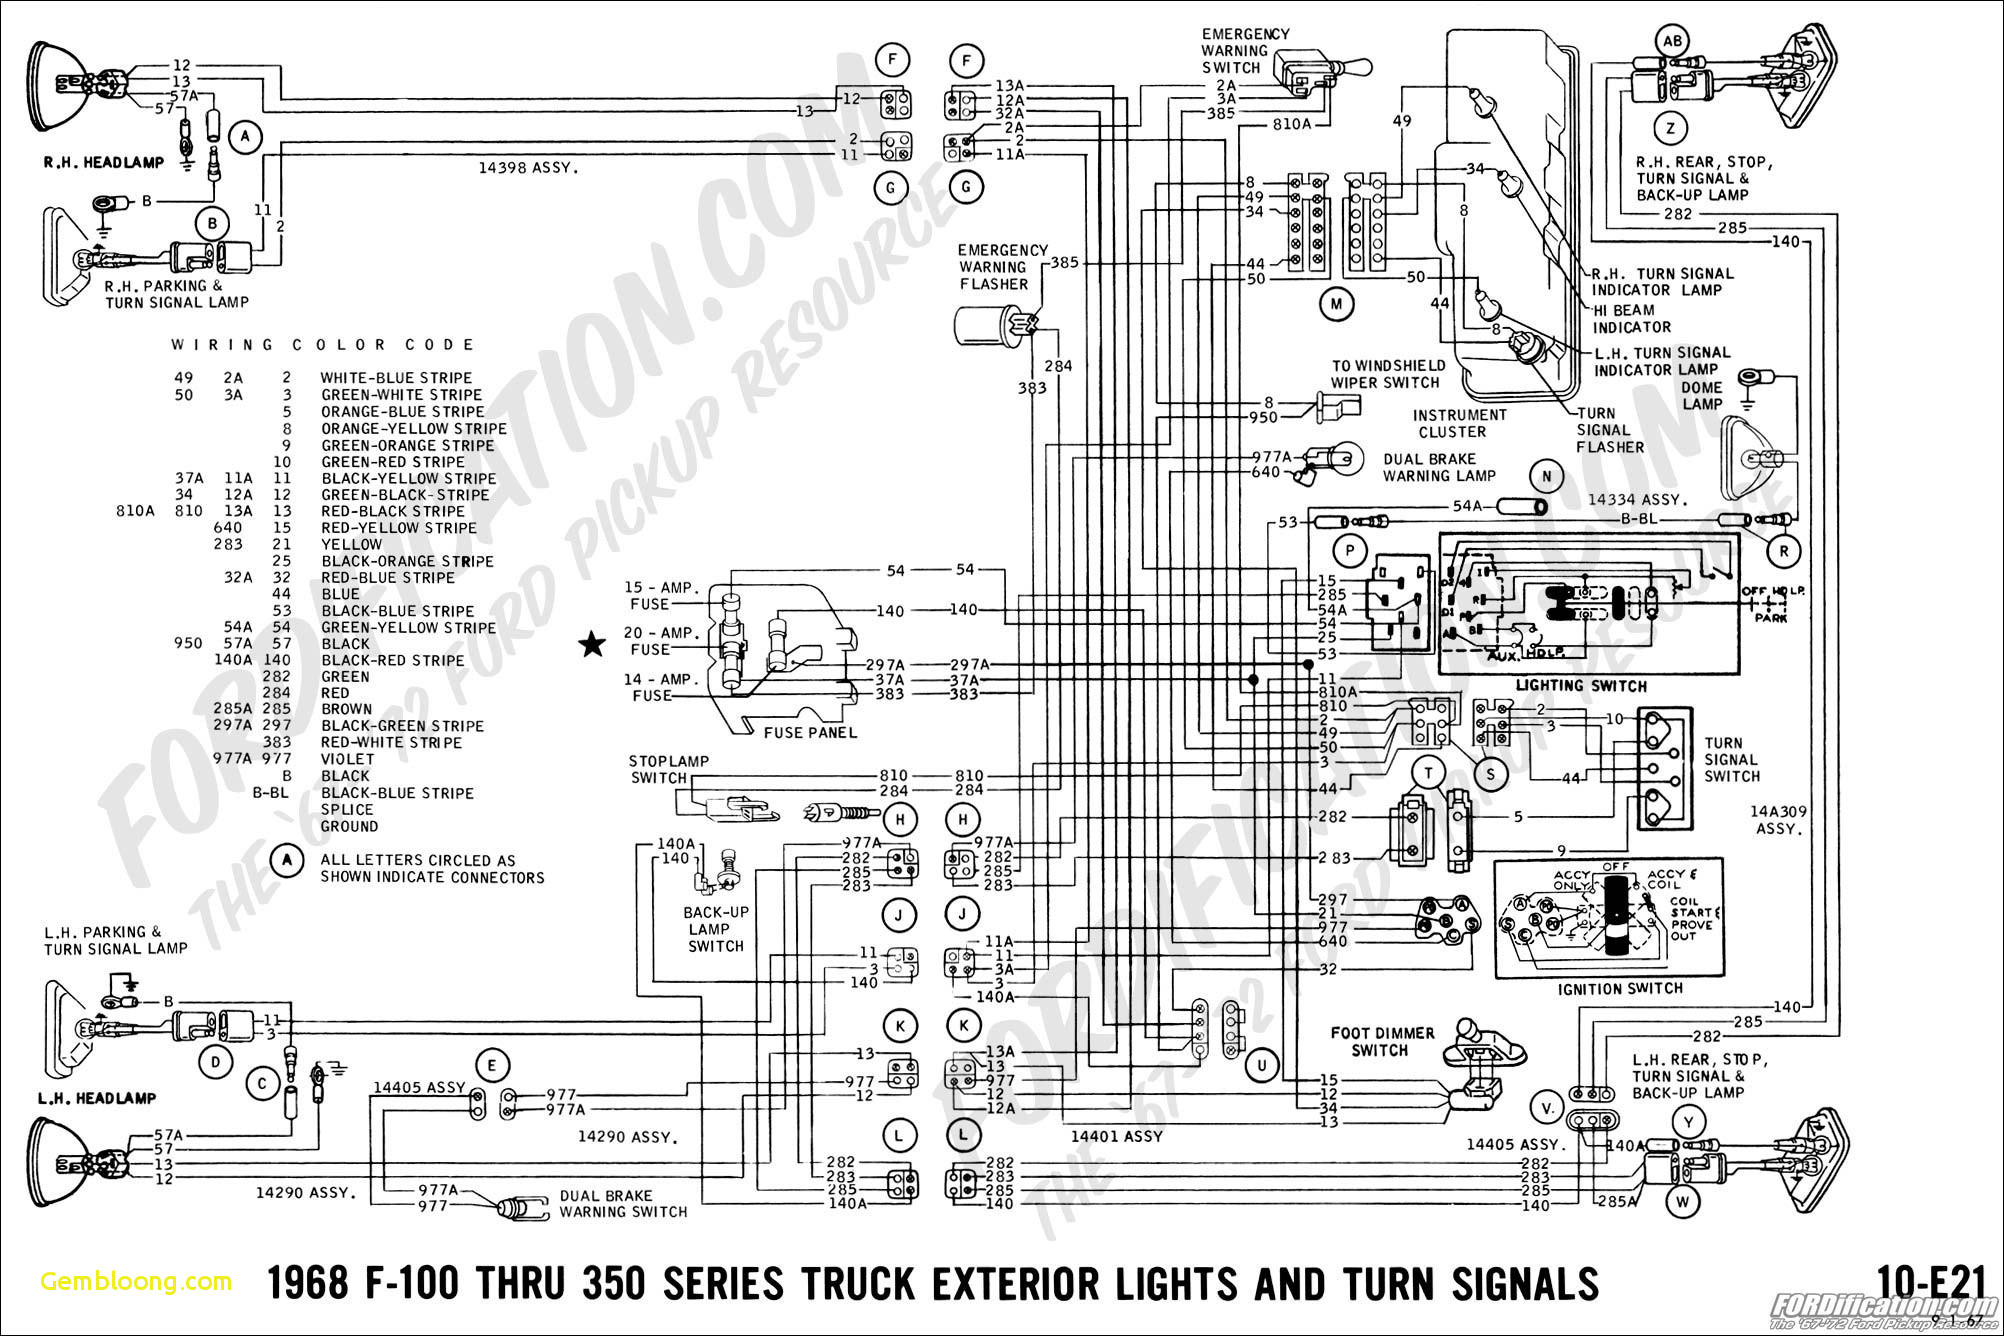 Wiring Diagram For Ford Pickup - Wiring Diagrams Hubs - Ford 8N Wiring Diagram